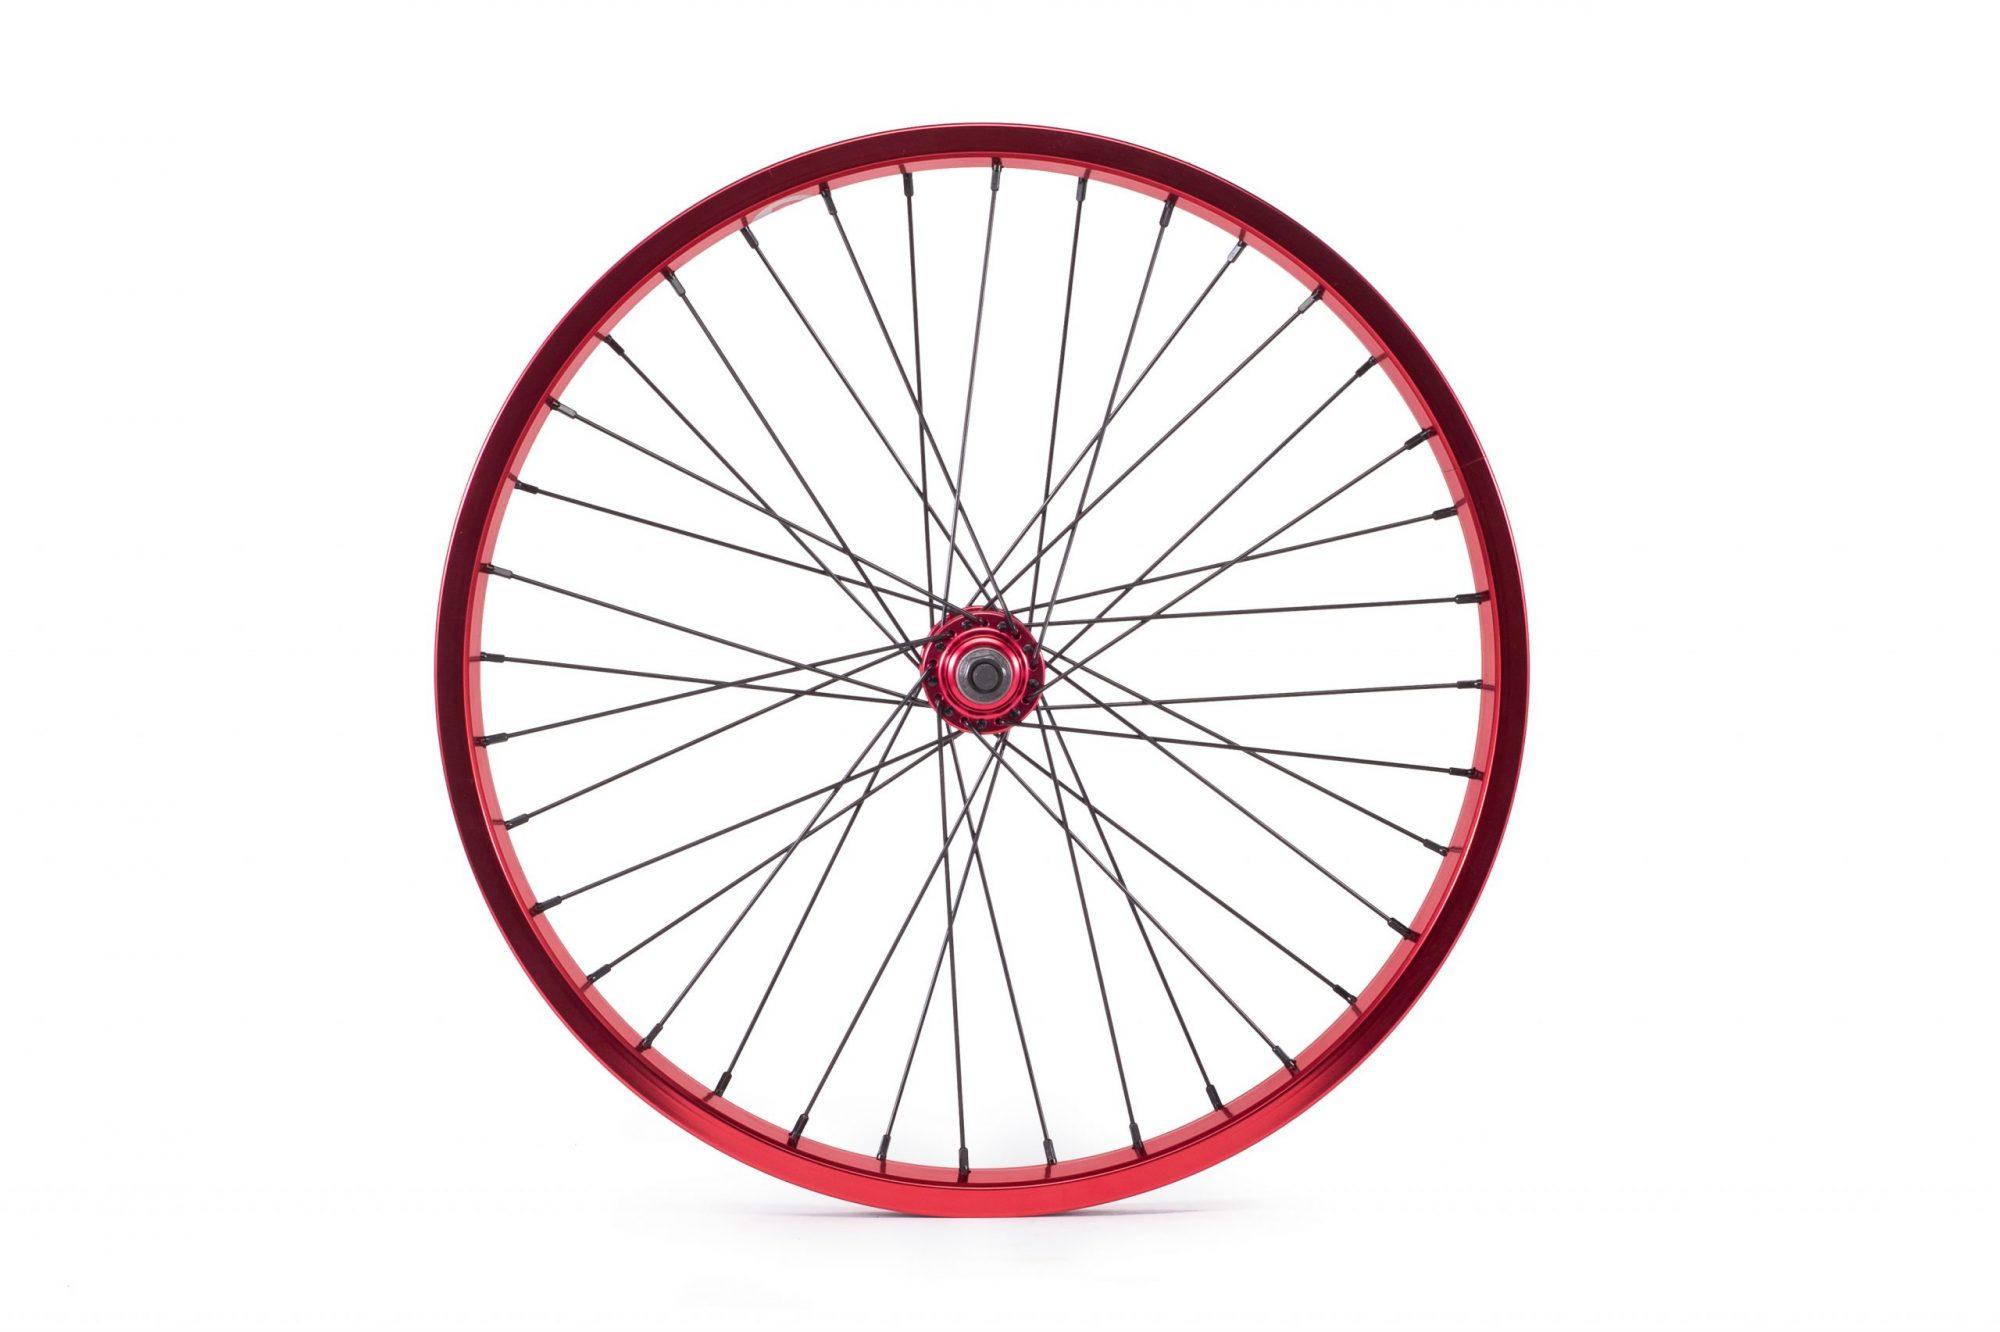 Salt_Everest_flipflop_rear_wheel_red_01